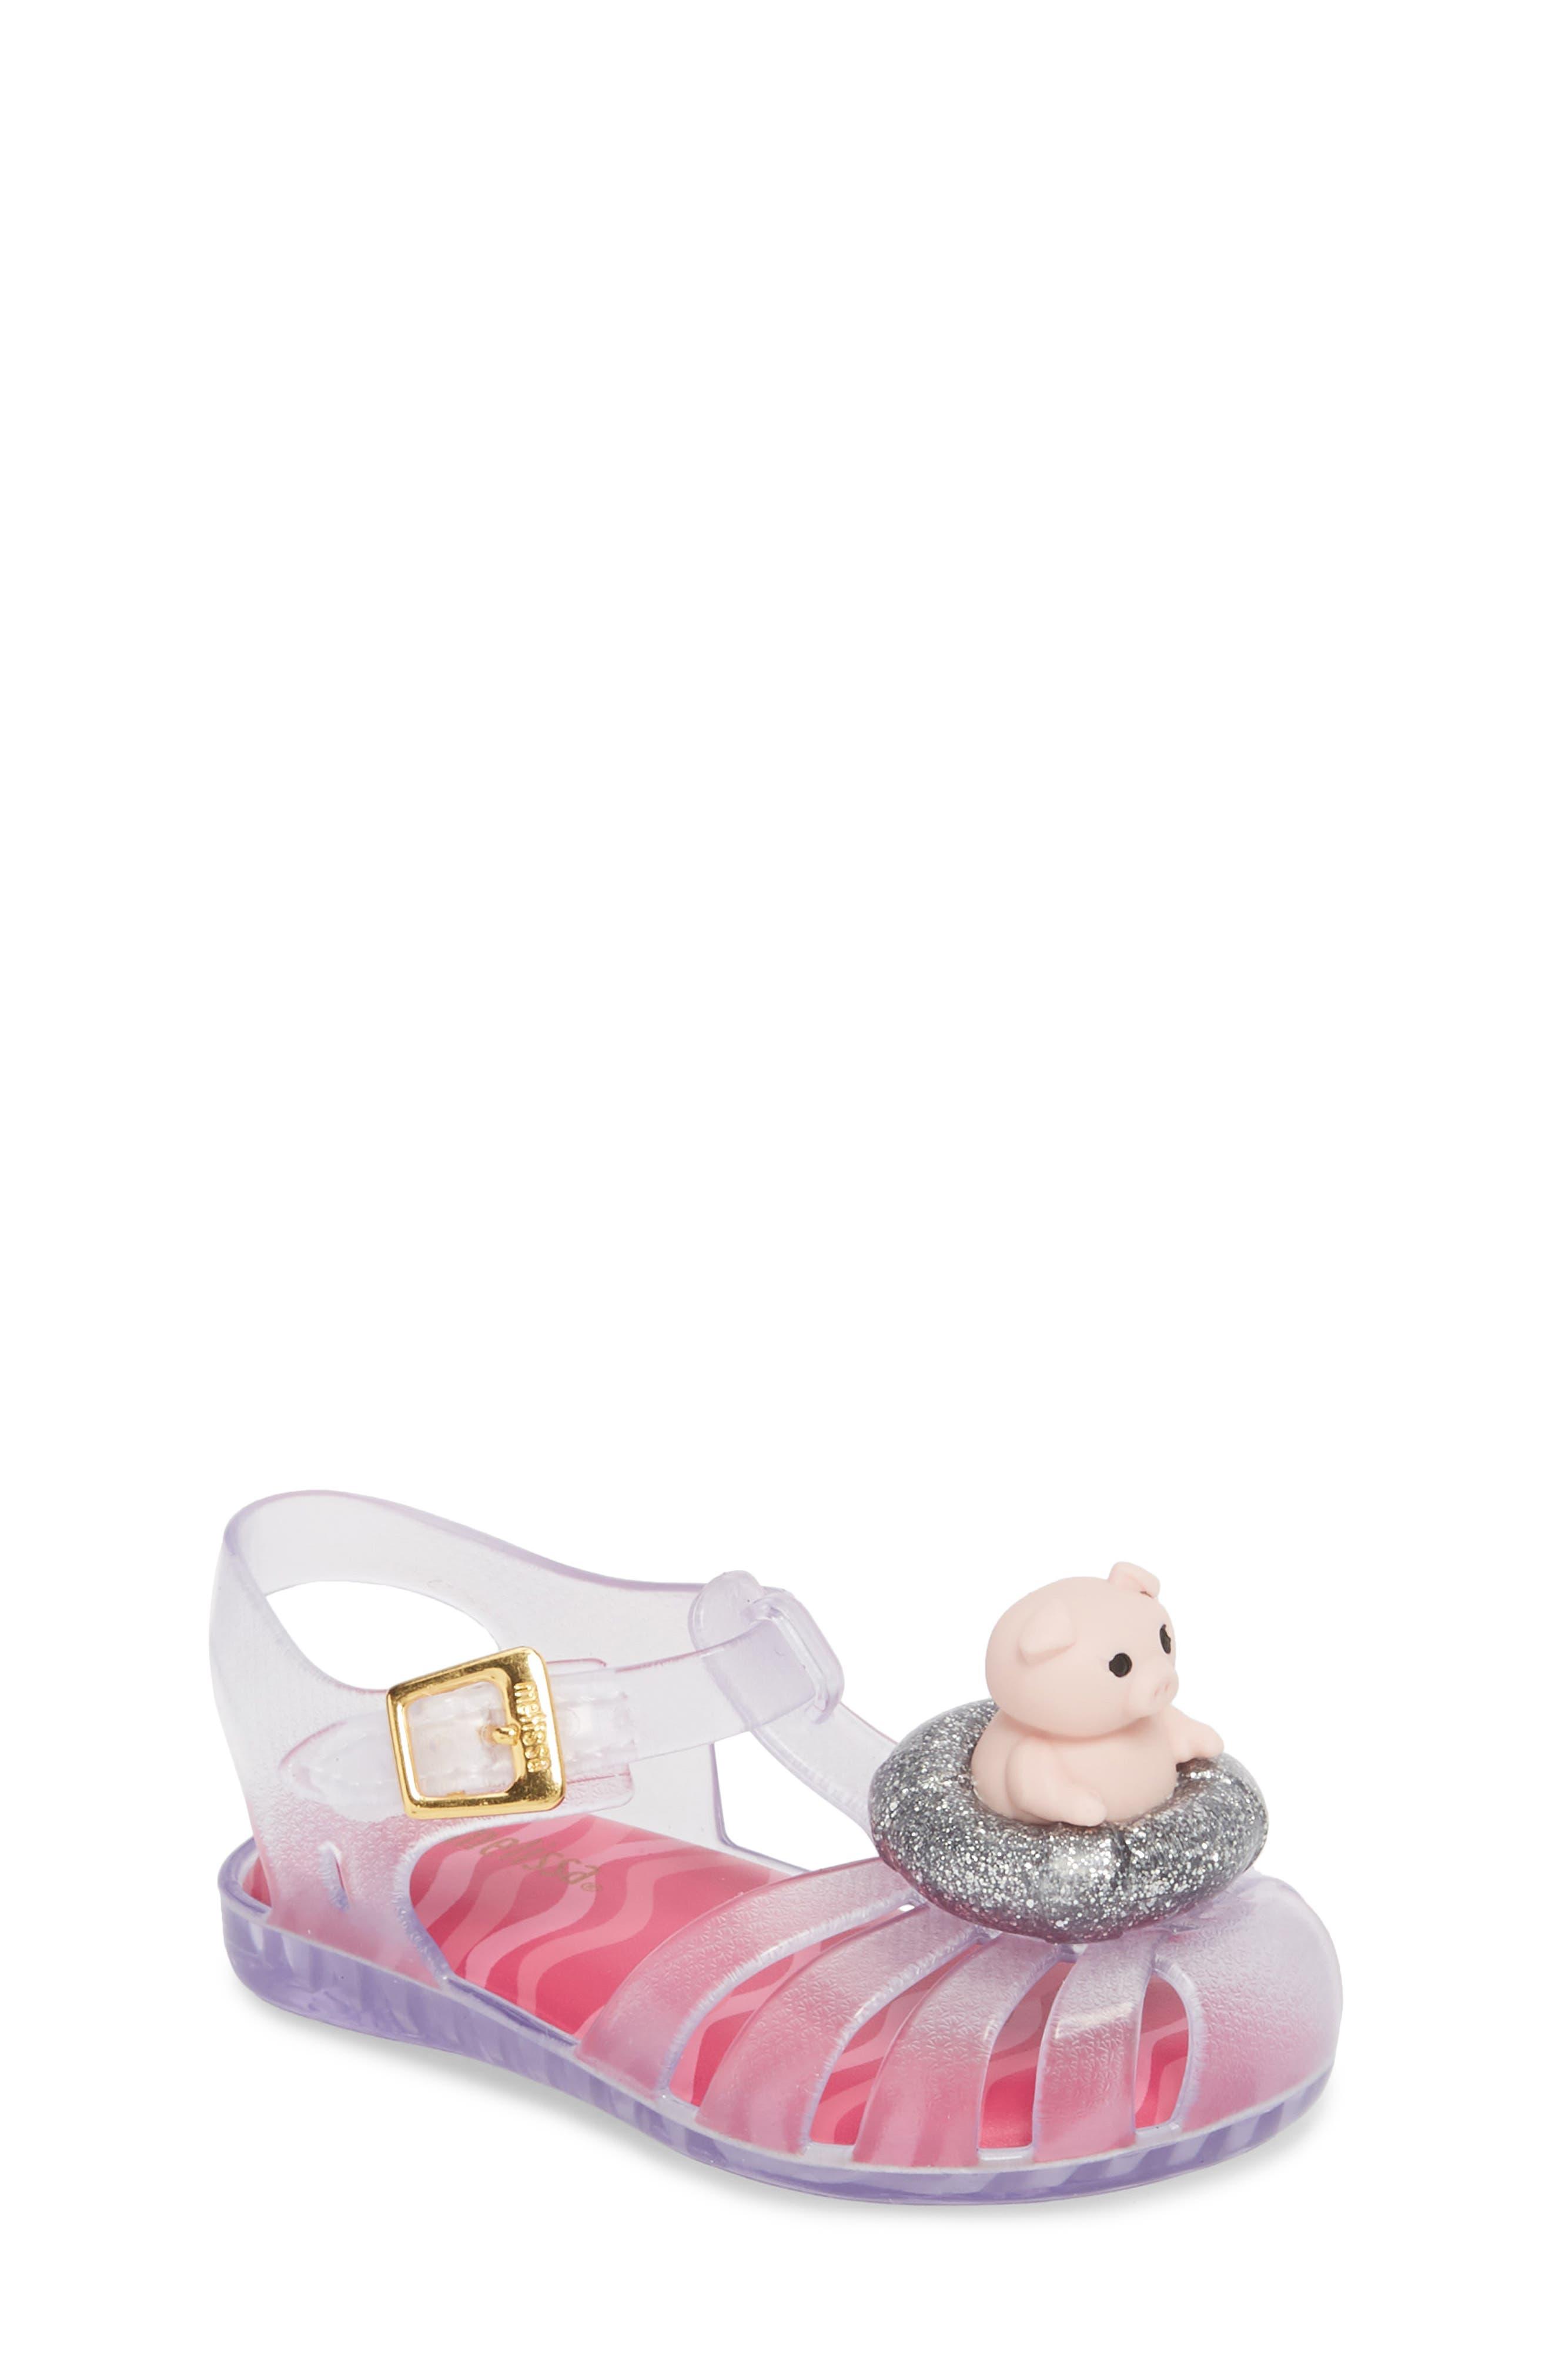 Alternate Image 1 Selected - Mini Melissa Aranha XI Jelly Sandal (Walker & Toddler)